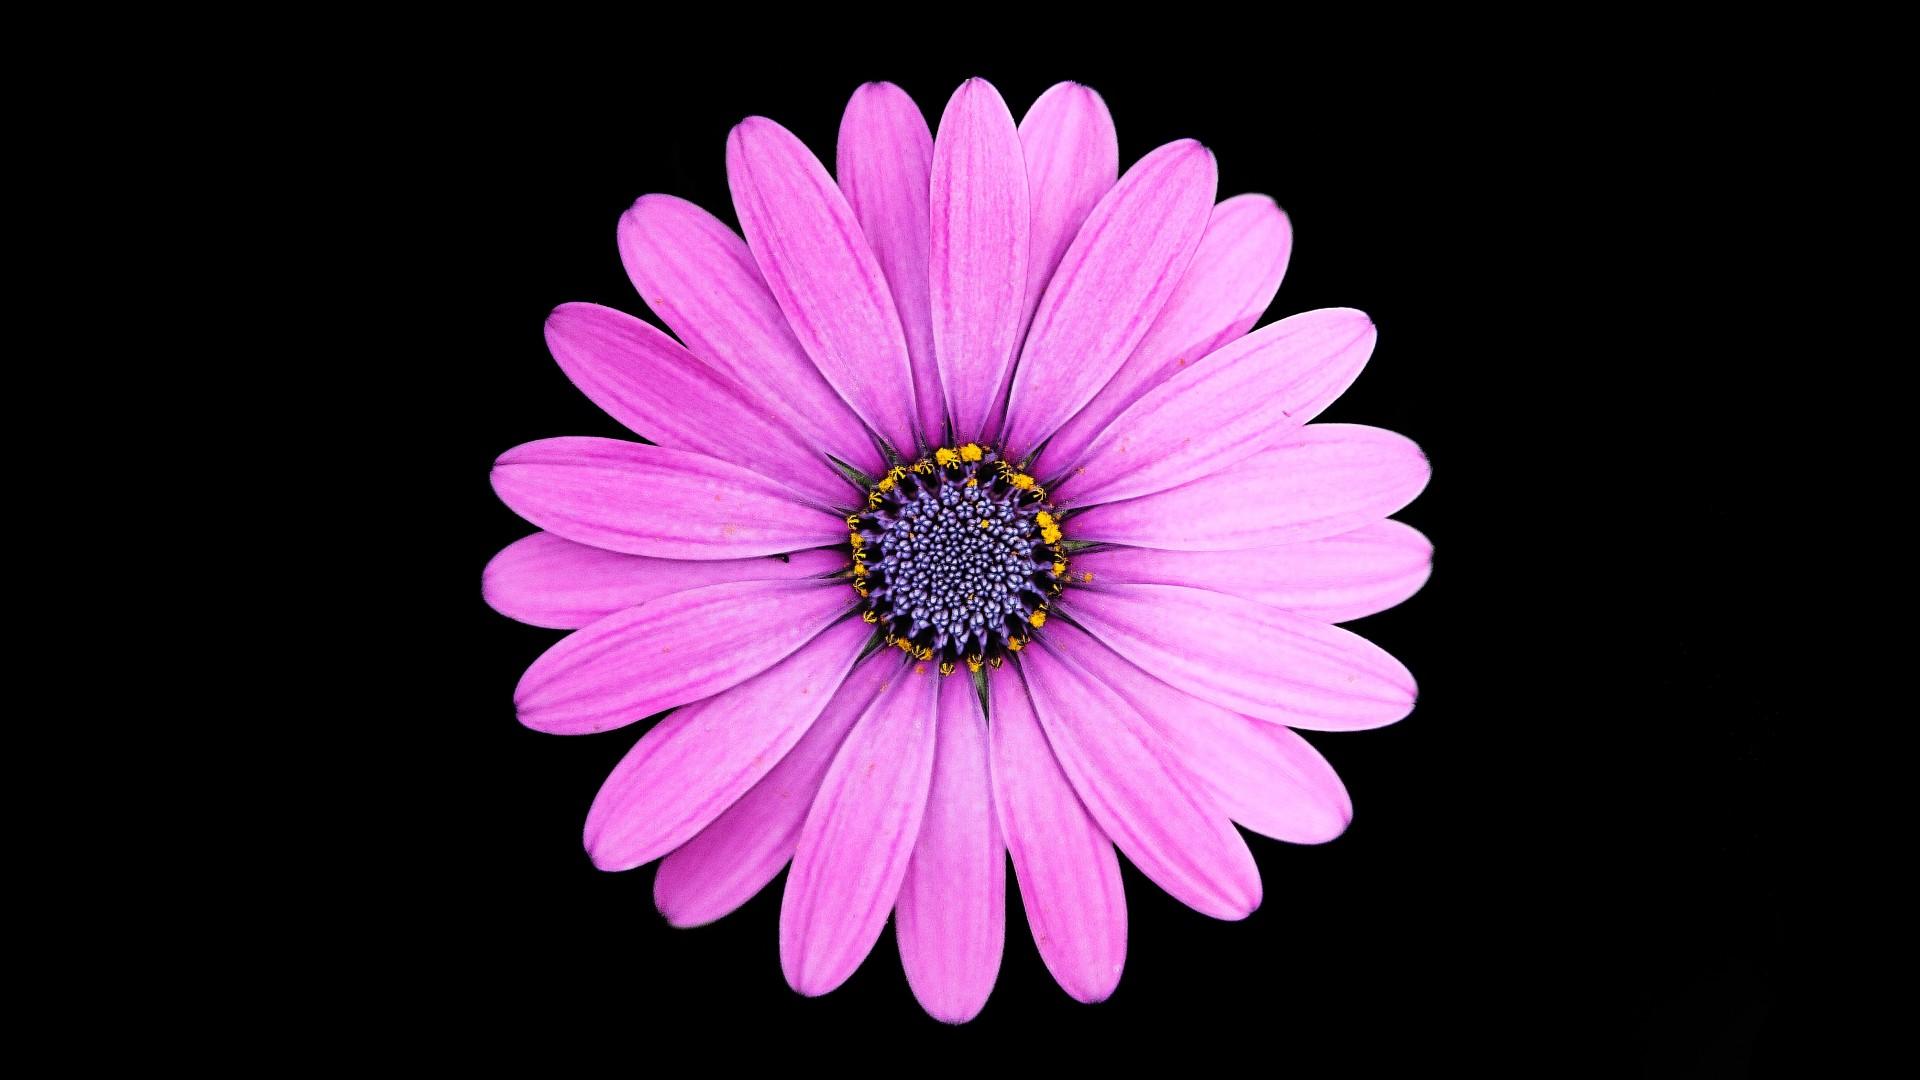 Cars 2 Wallpaper For Windows 7 Margarita Purple Daisy Flower 4k Wallpapers Hd